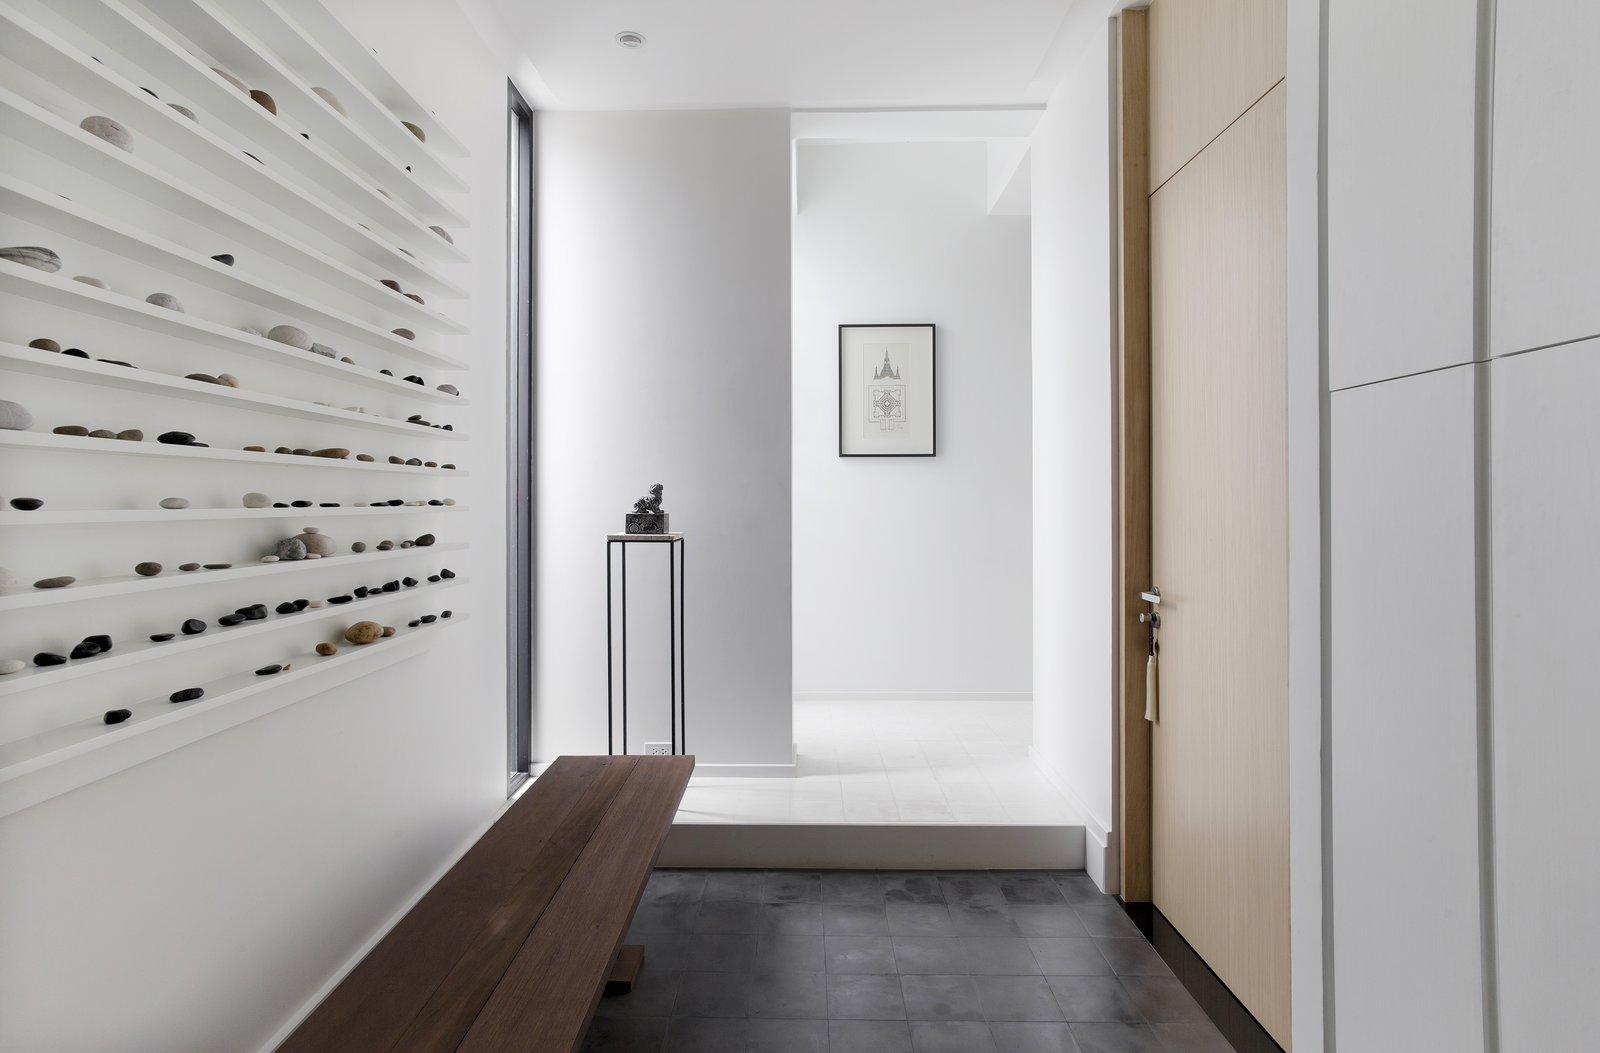 Bench, Hallway, and Ceramic Tile Floor  Huamark 09